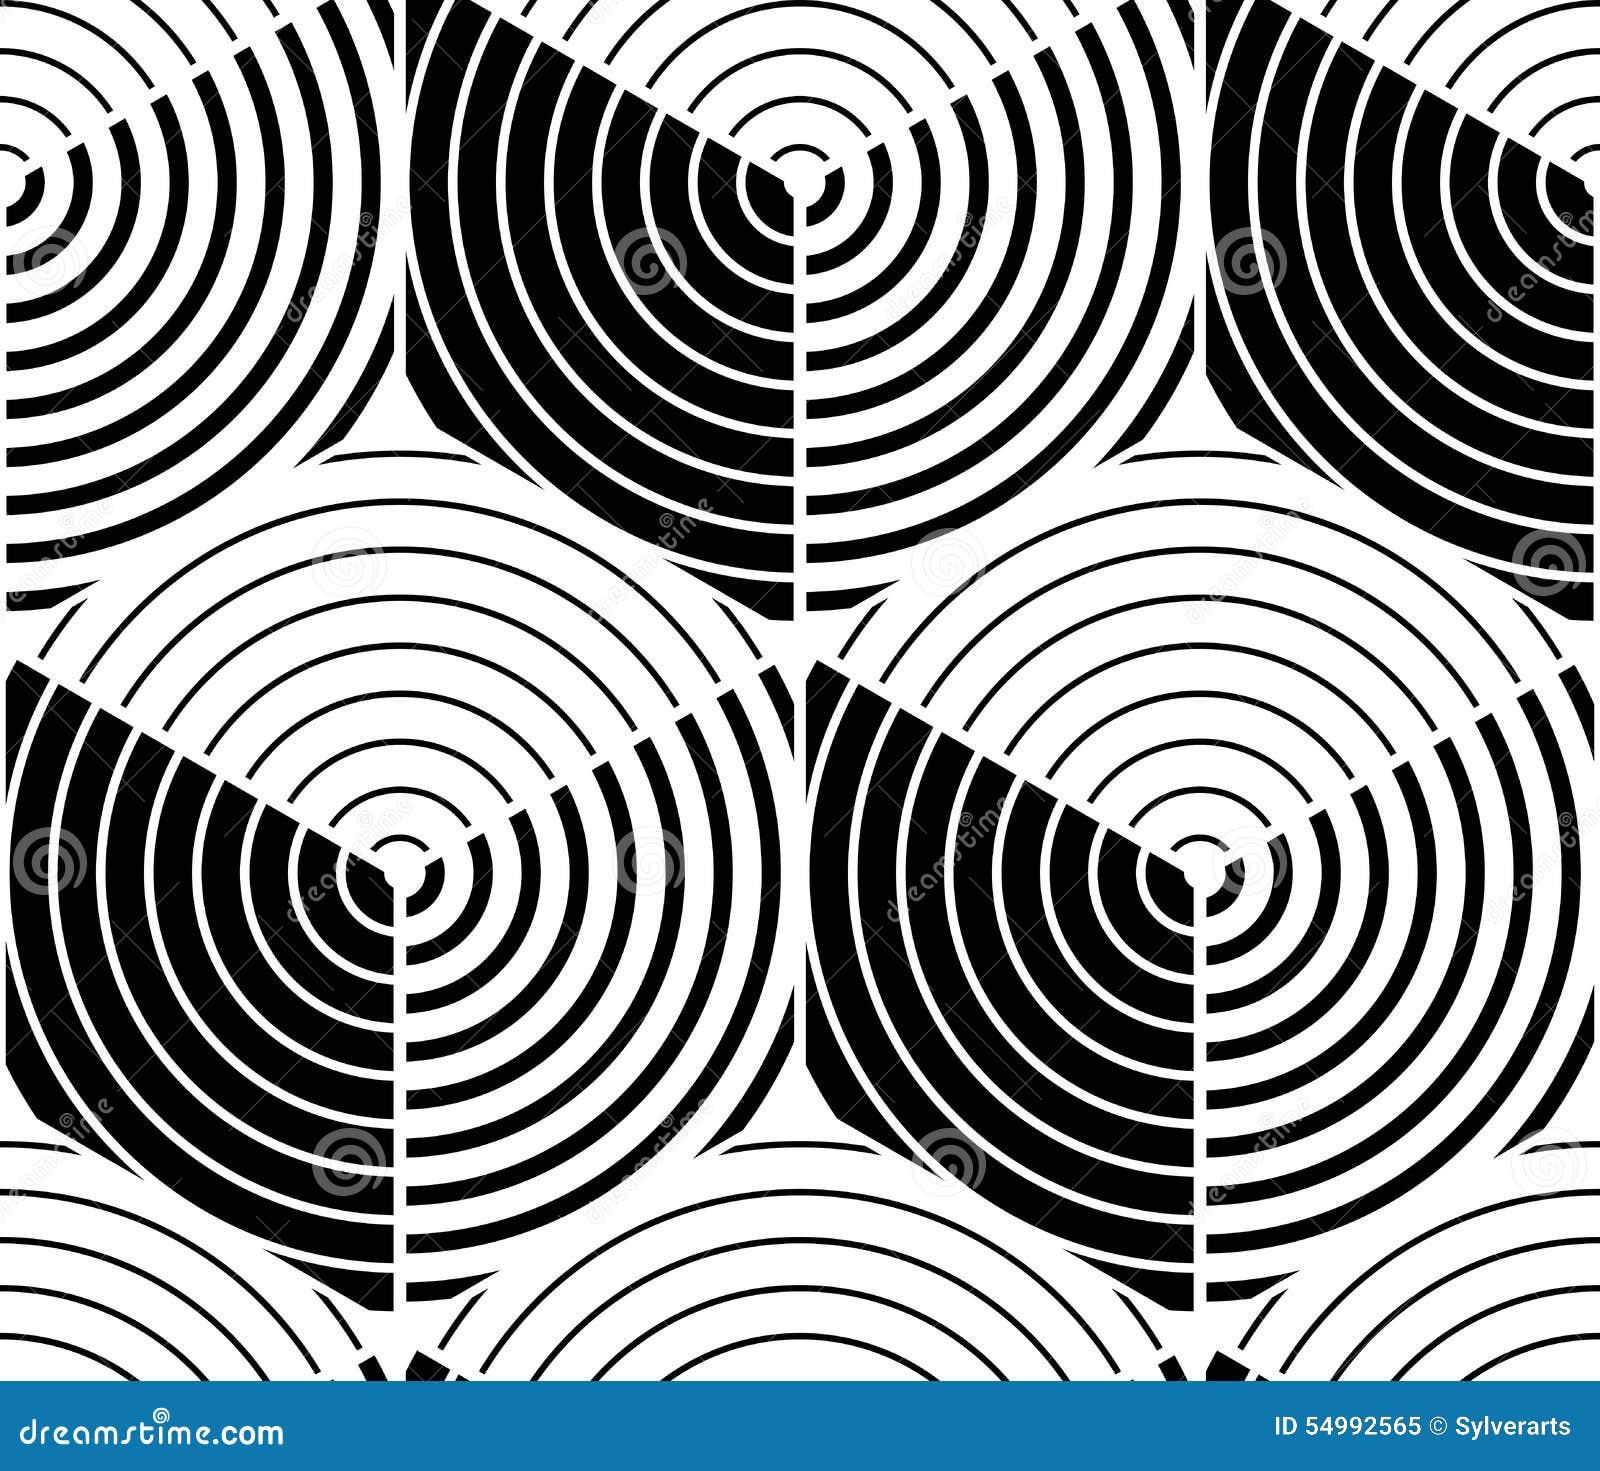 Ändlös monokrom symmetrisk modell, grafisk design geometriskt